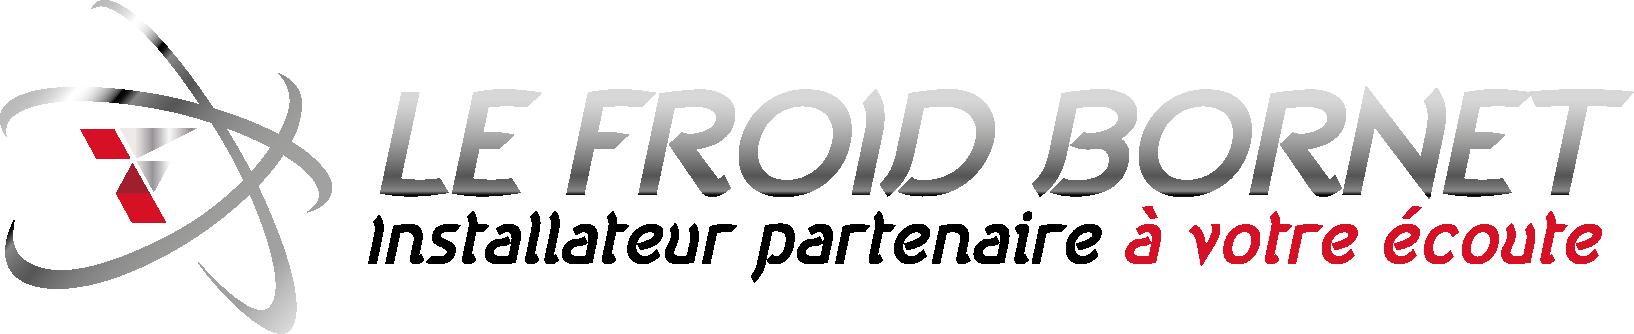 Le Froid Bornet